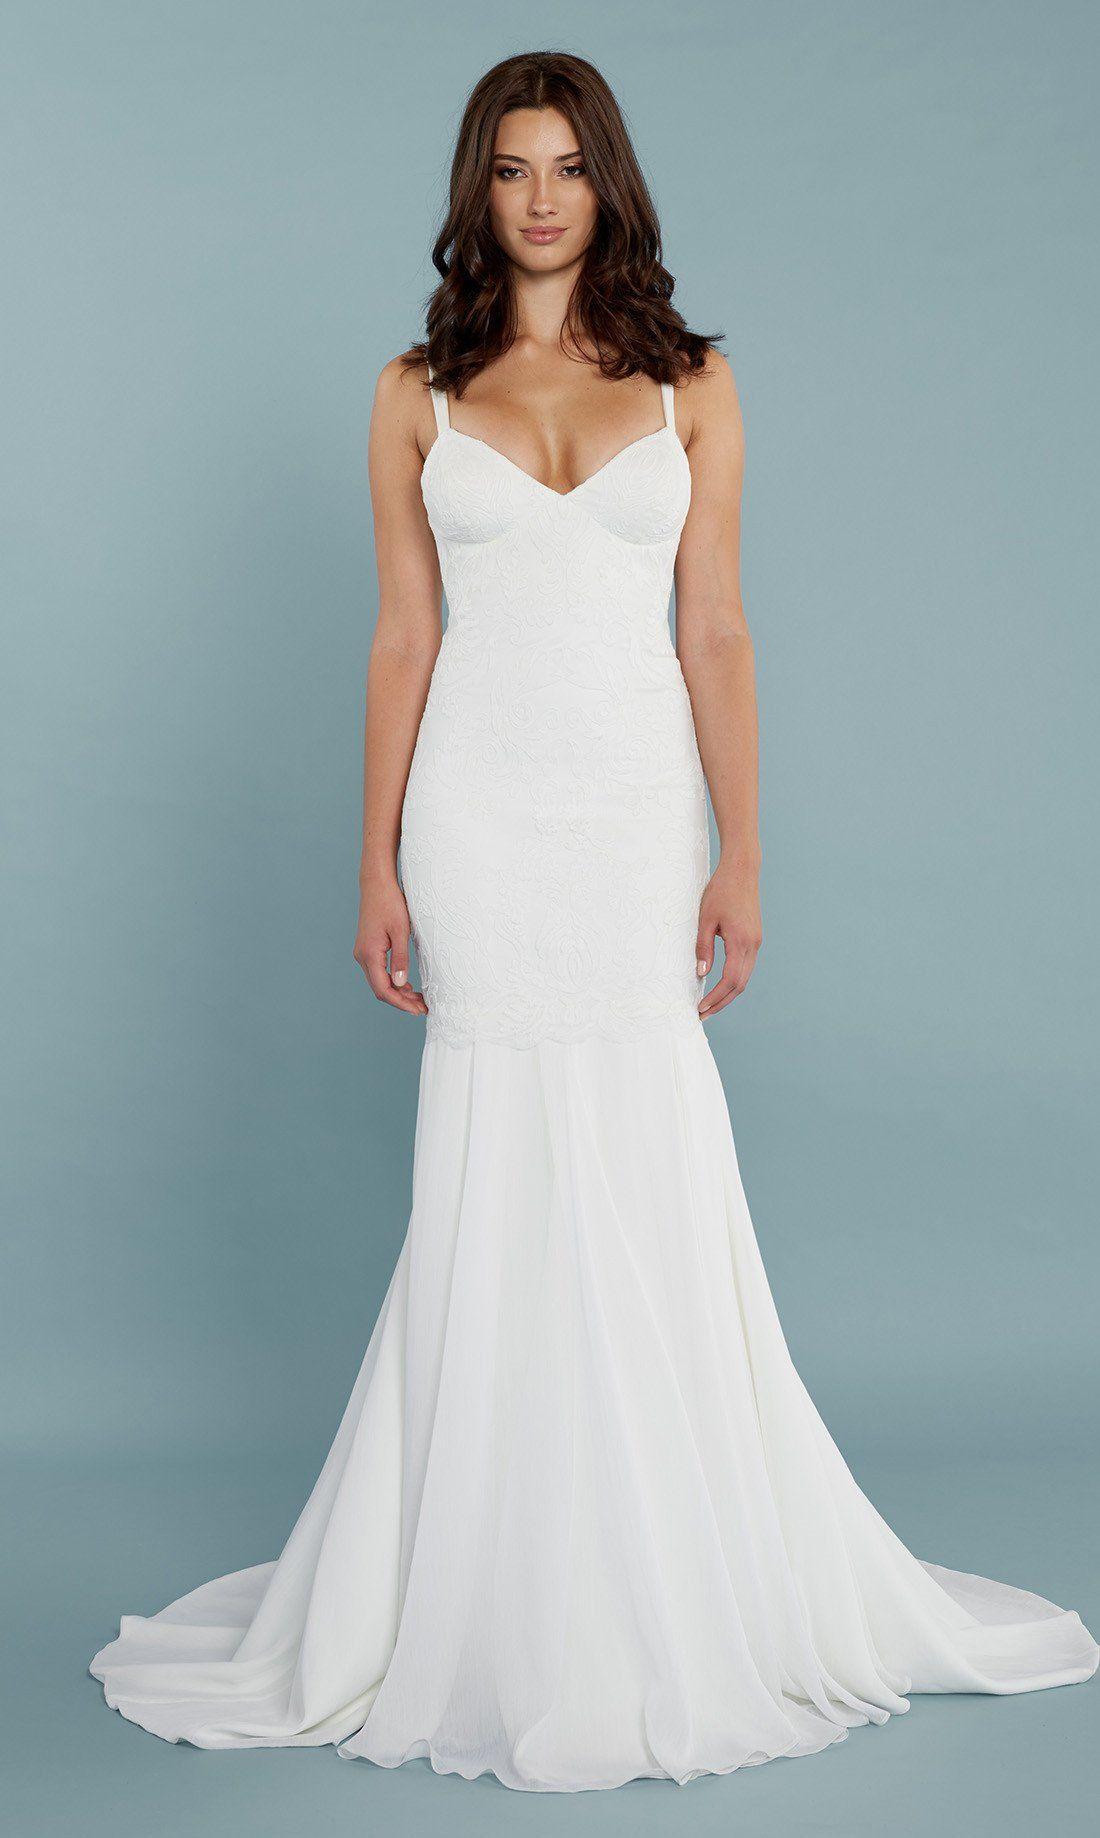 HIGH_RES_MONACO_18805_WEBSITE.jpg (1100×1838) | Bridal Gowns ...